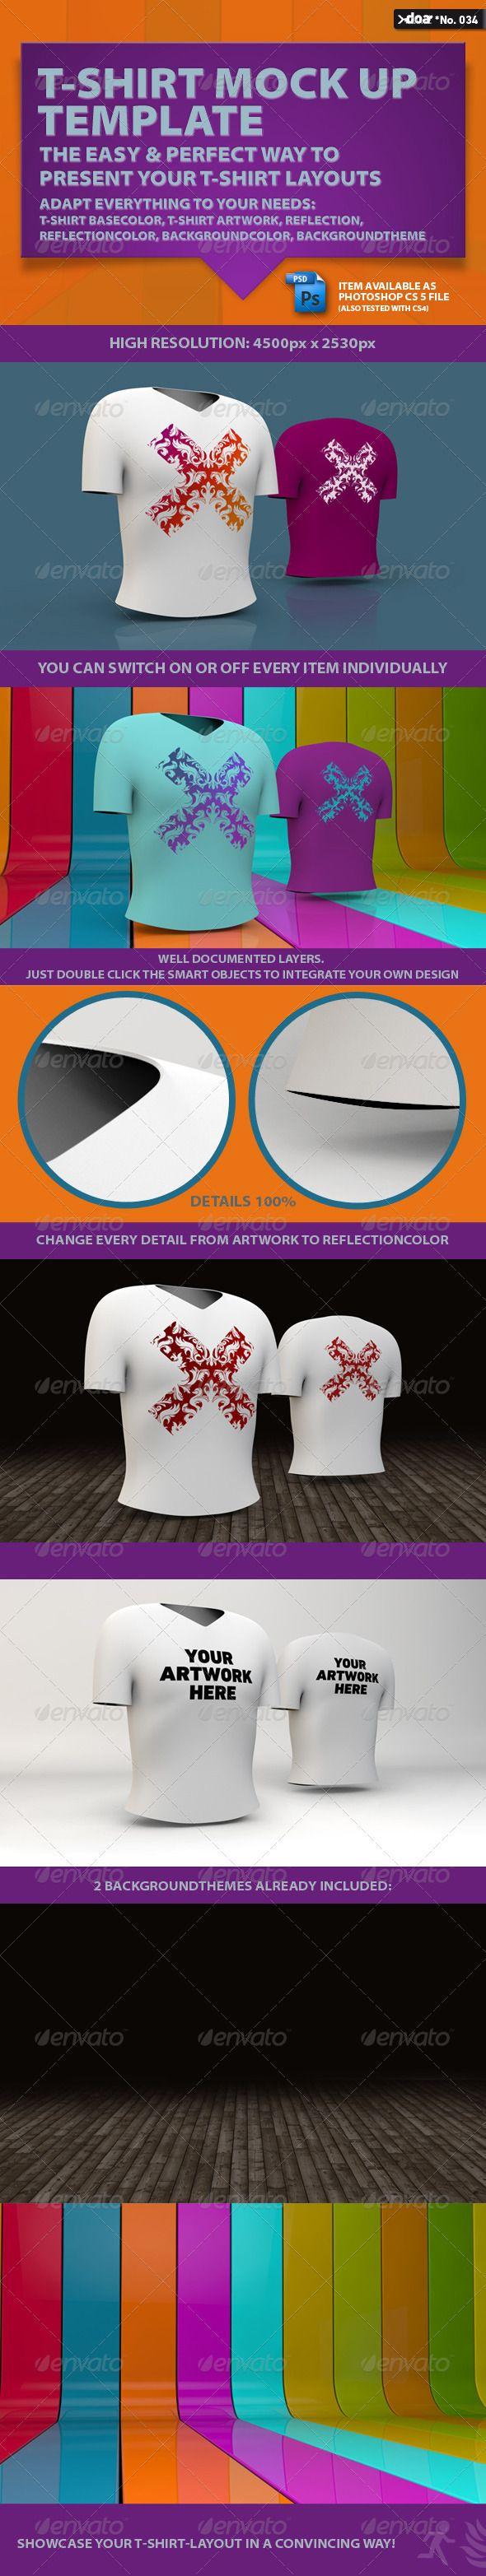 Design t shirt photoshop cs5 - T Shirt Mock Up Template